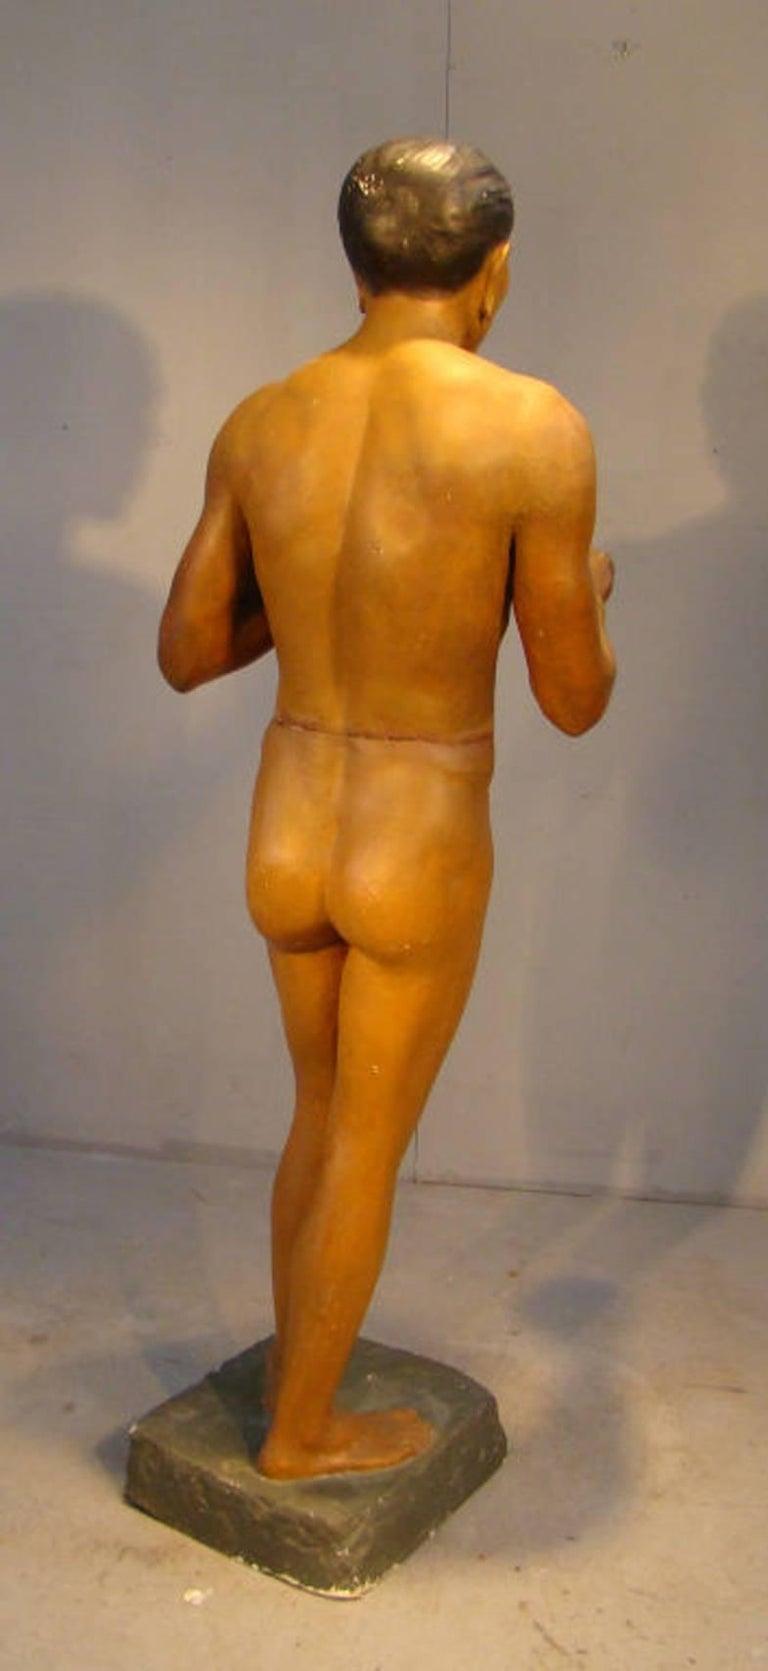 European Ancient Plaster Statue, Origin Musee Civilisation, circa 1900-1930 For Sale